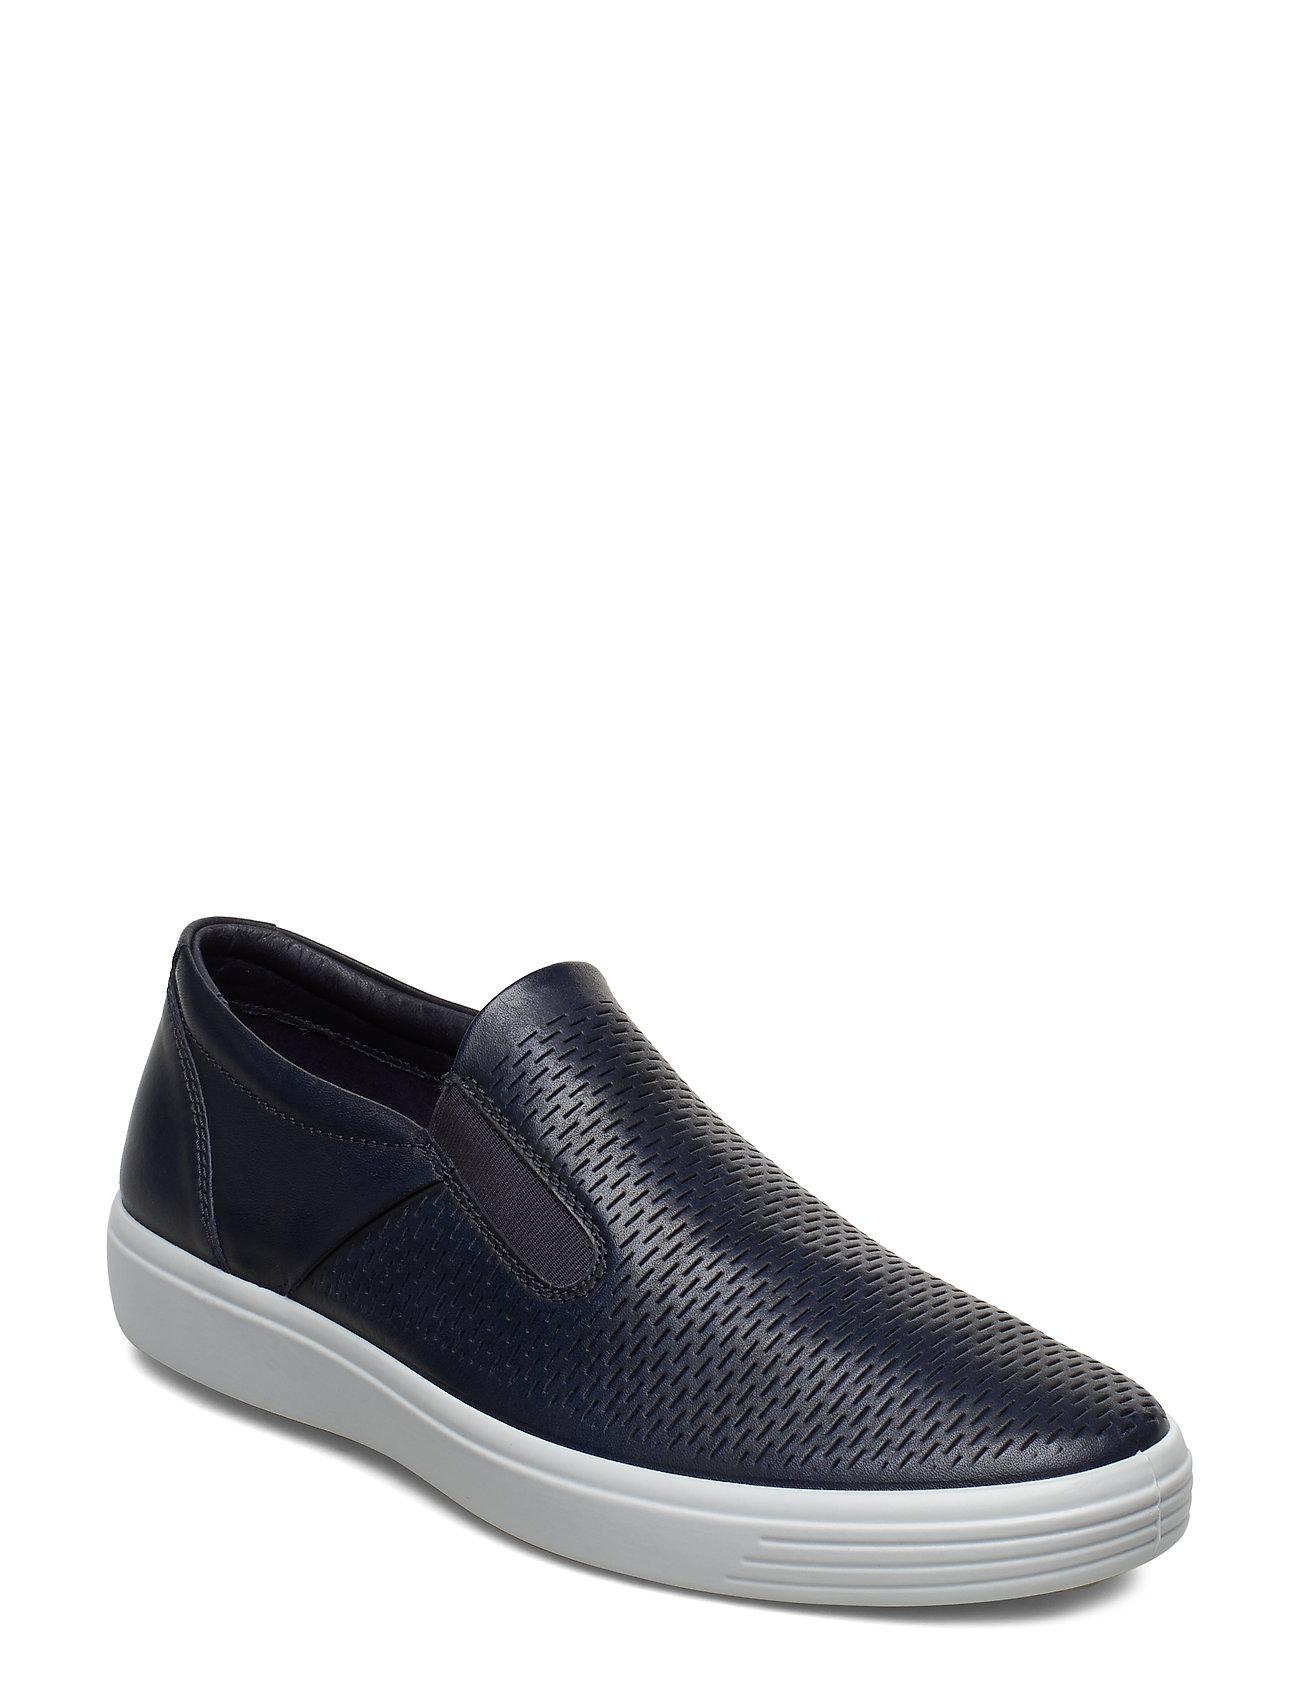 Image of Soft 7 M Sneakers Blå ECCO (3309075837)